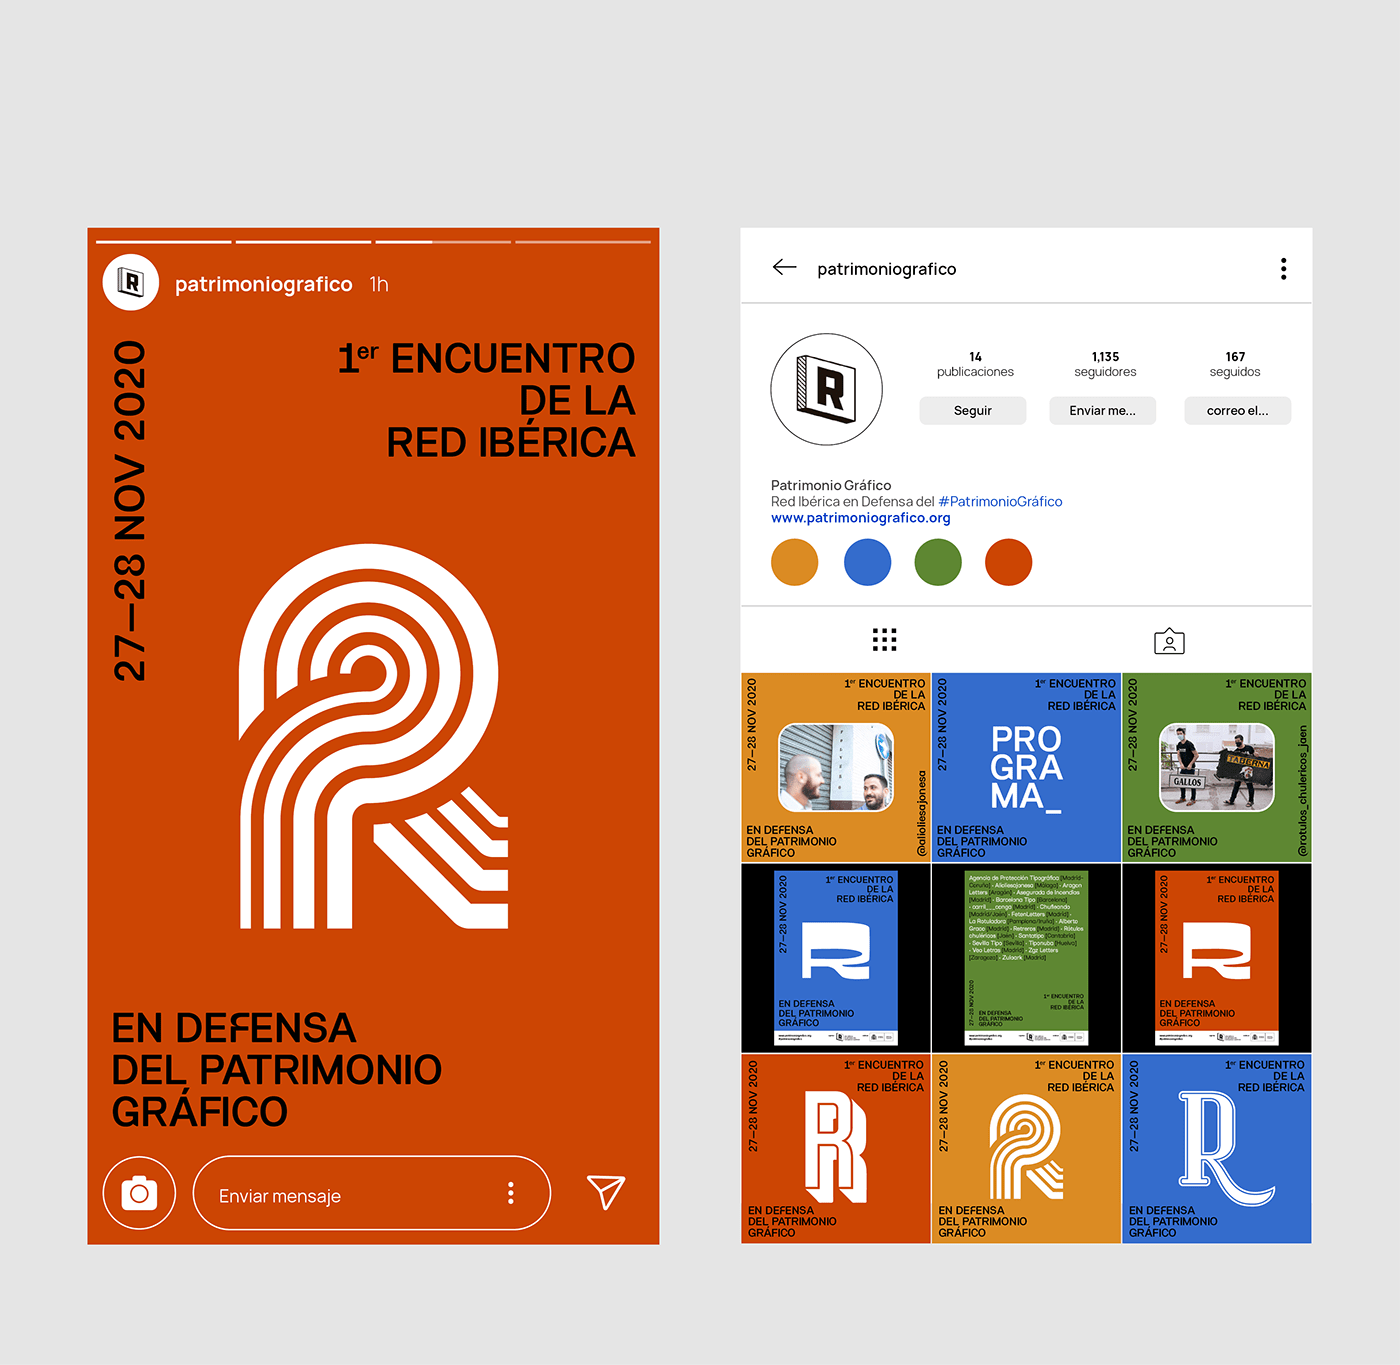 animation  branding  Event graphic heritage Layout Merch patrimonio gráfico poster sign street typography